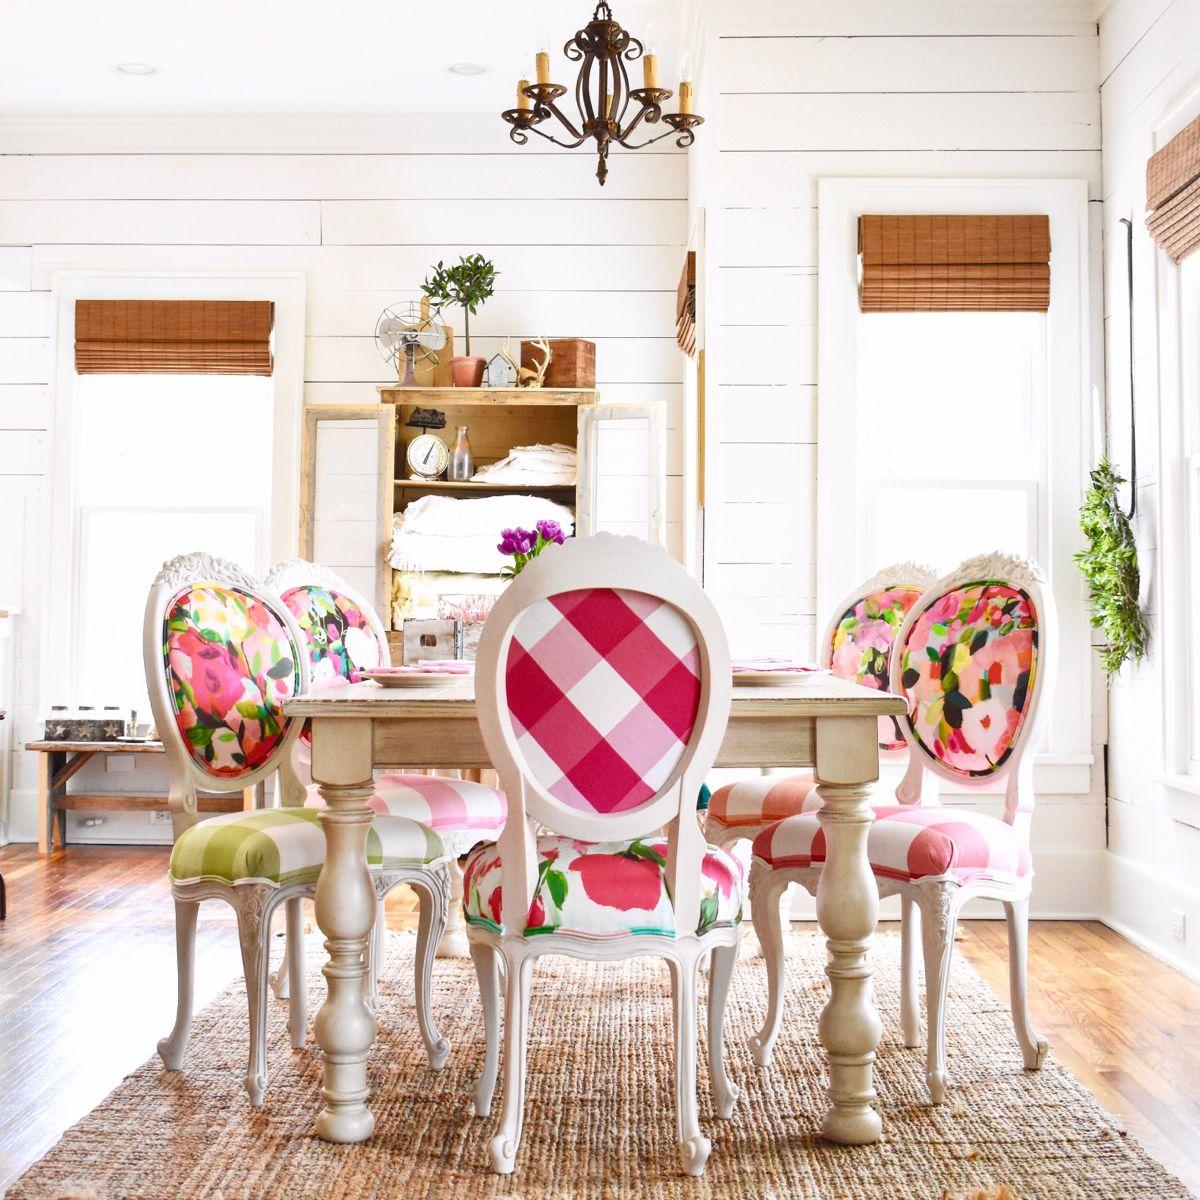 Havlu Kumas Koltuk At Home With Alex Eagle Editorials Zara Home Turquia 2020 Zara Home Zara Nevresim